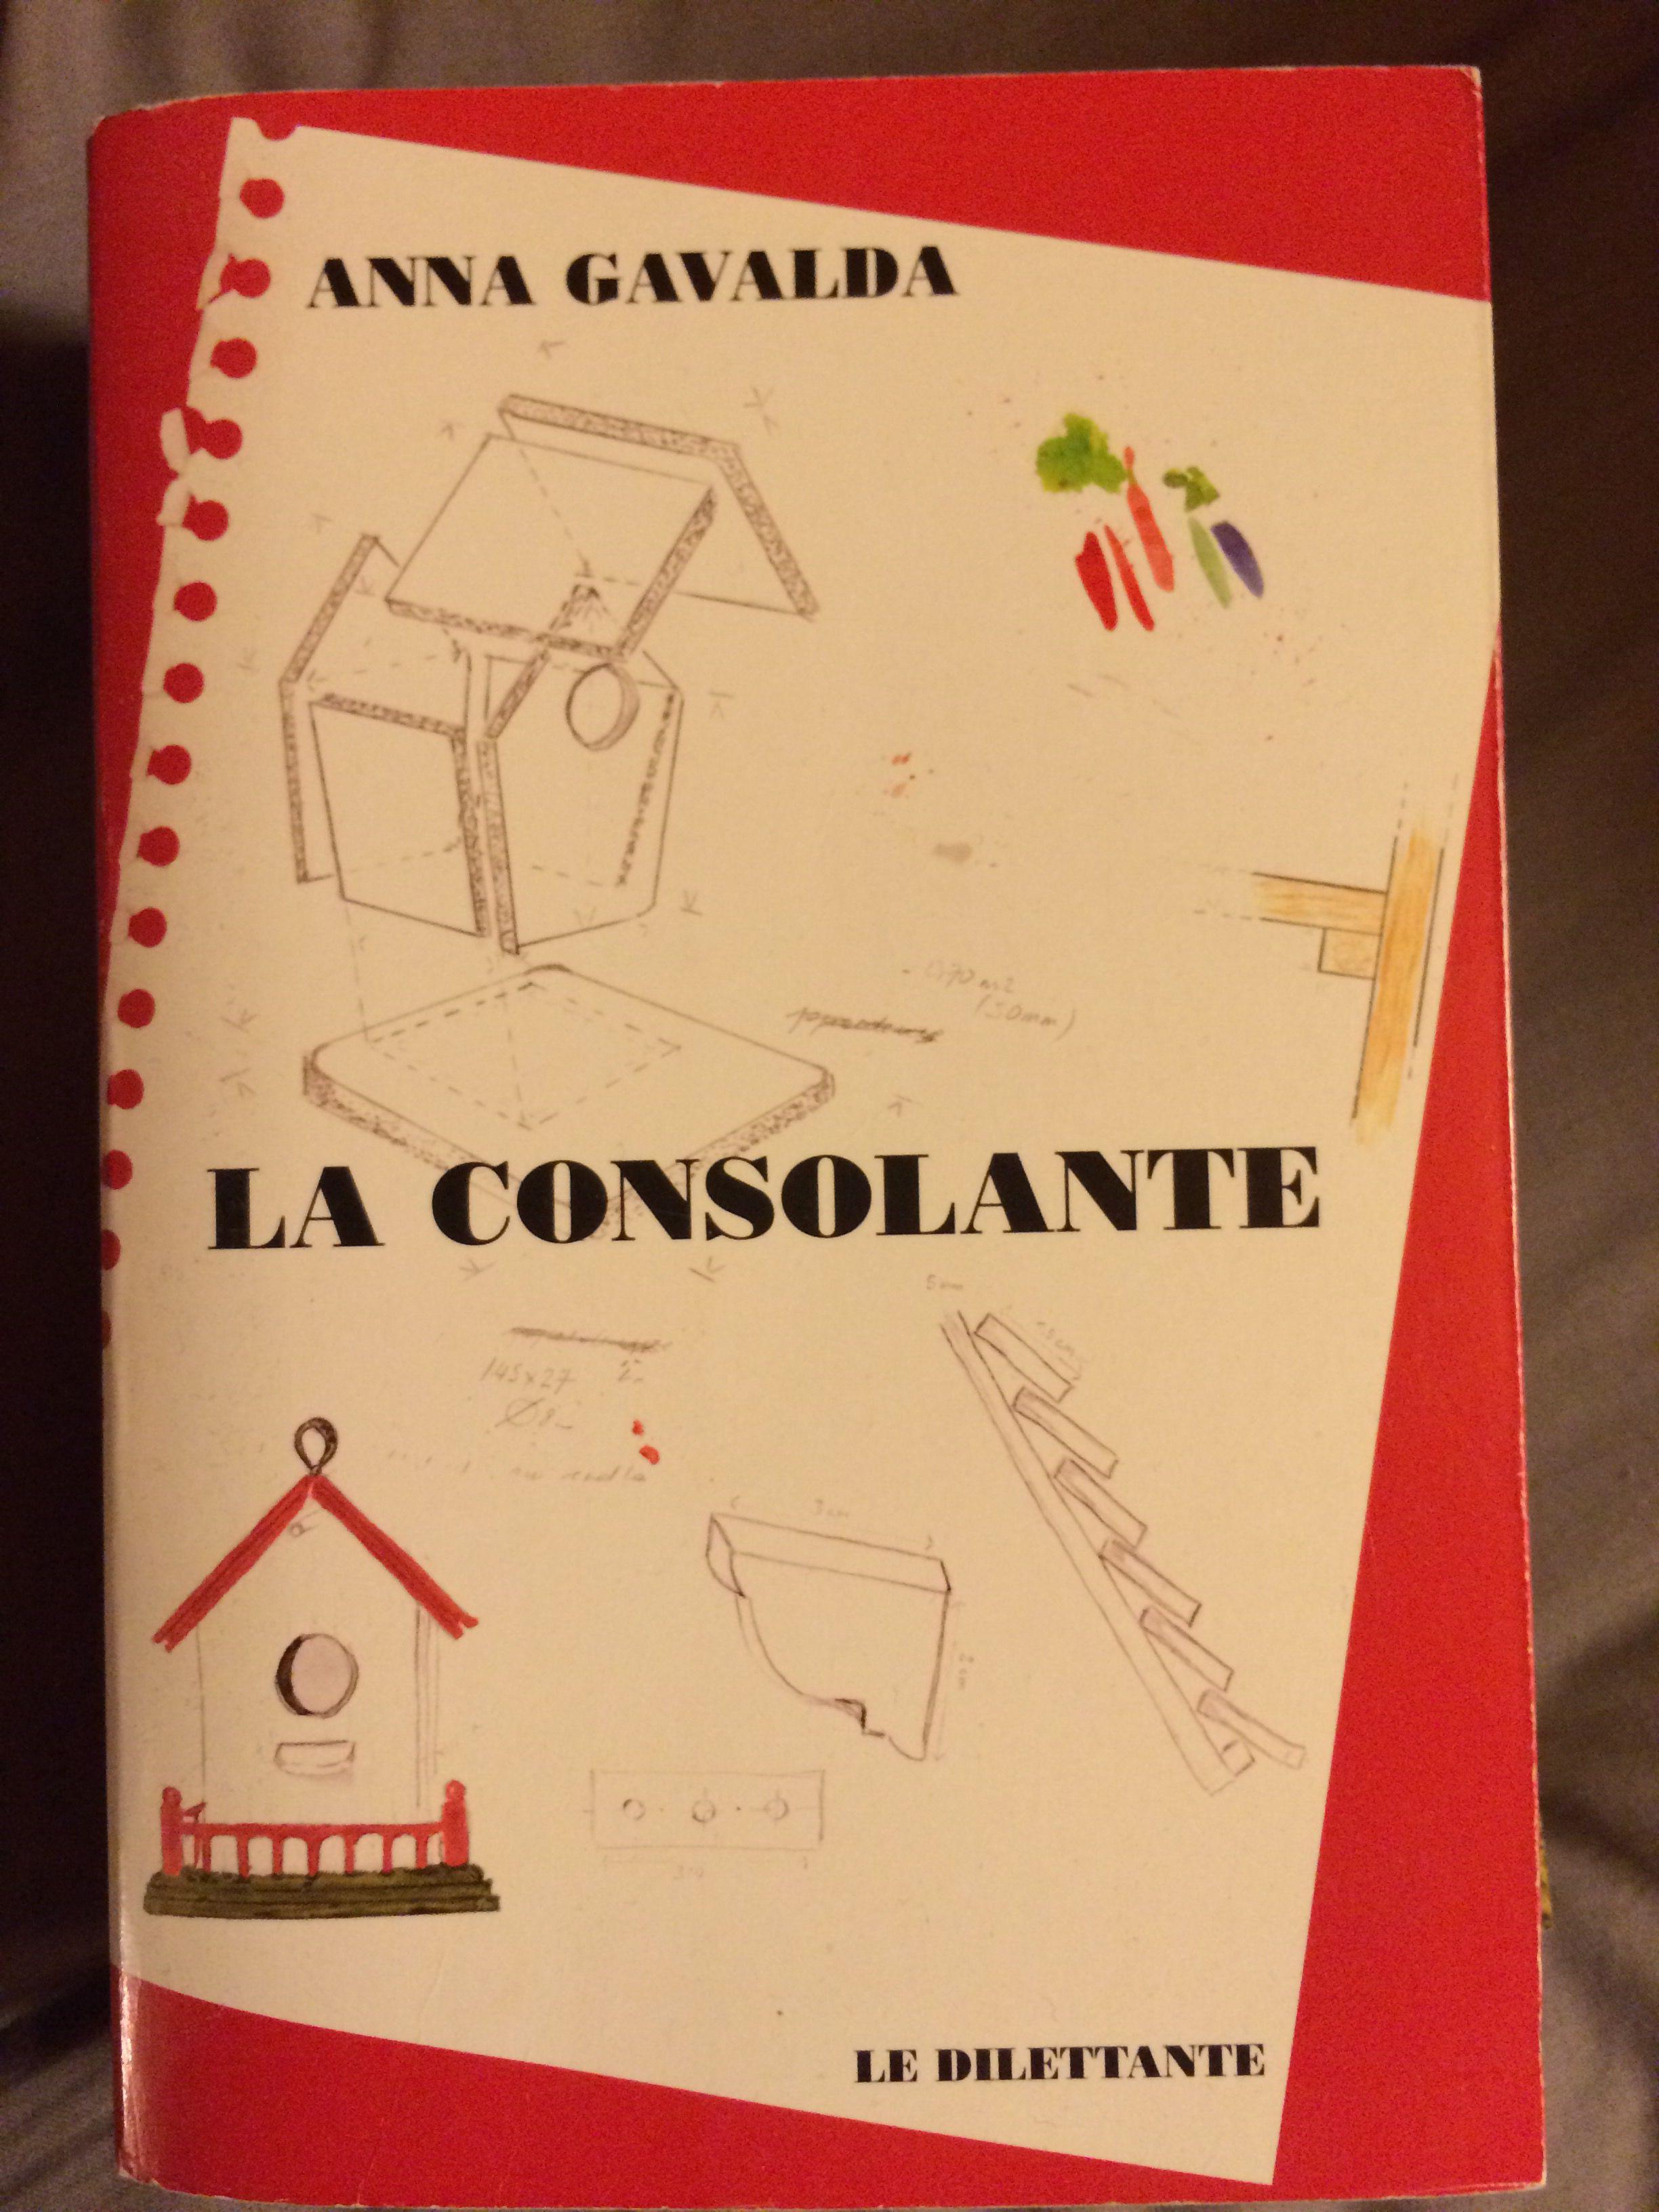 Anna Gavalda - La consolante | me and you | Pinterest | Anna gavalda on